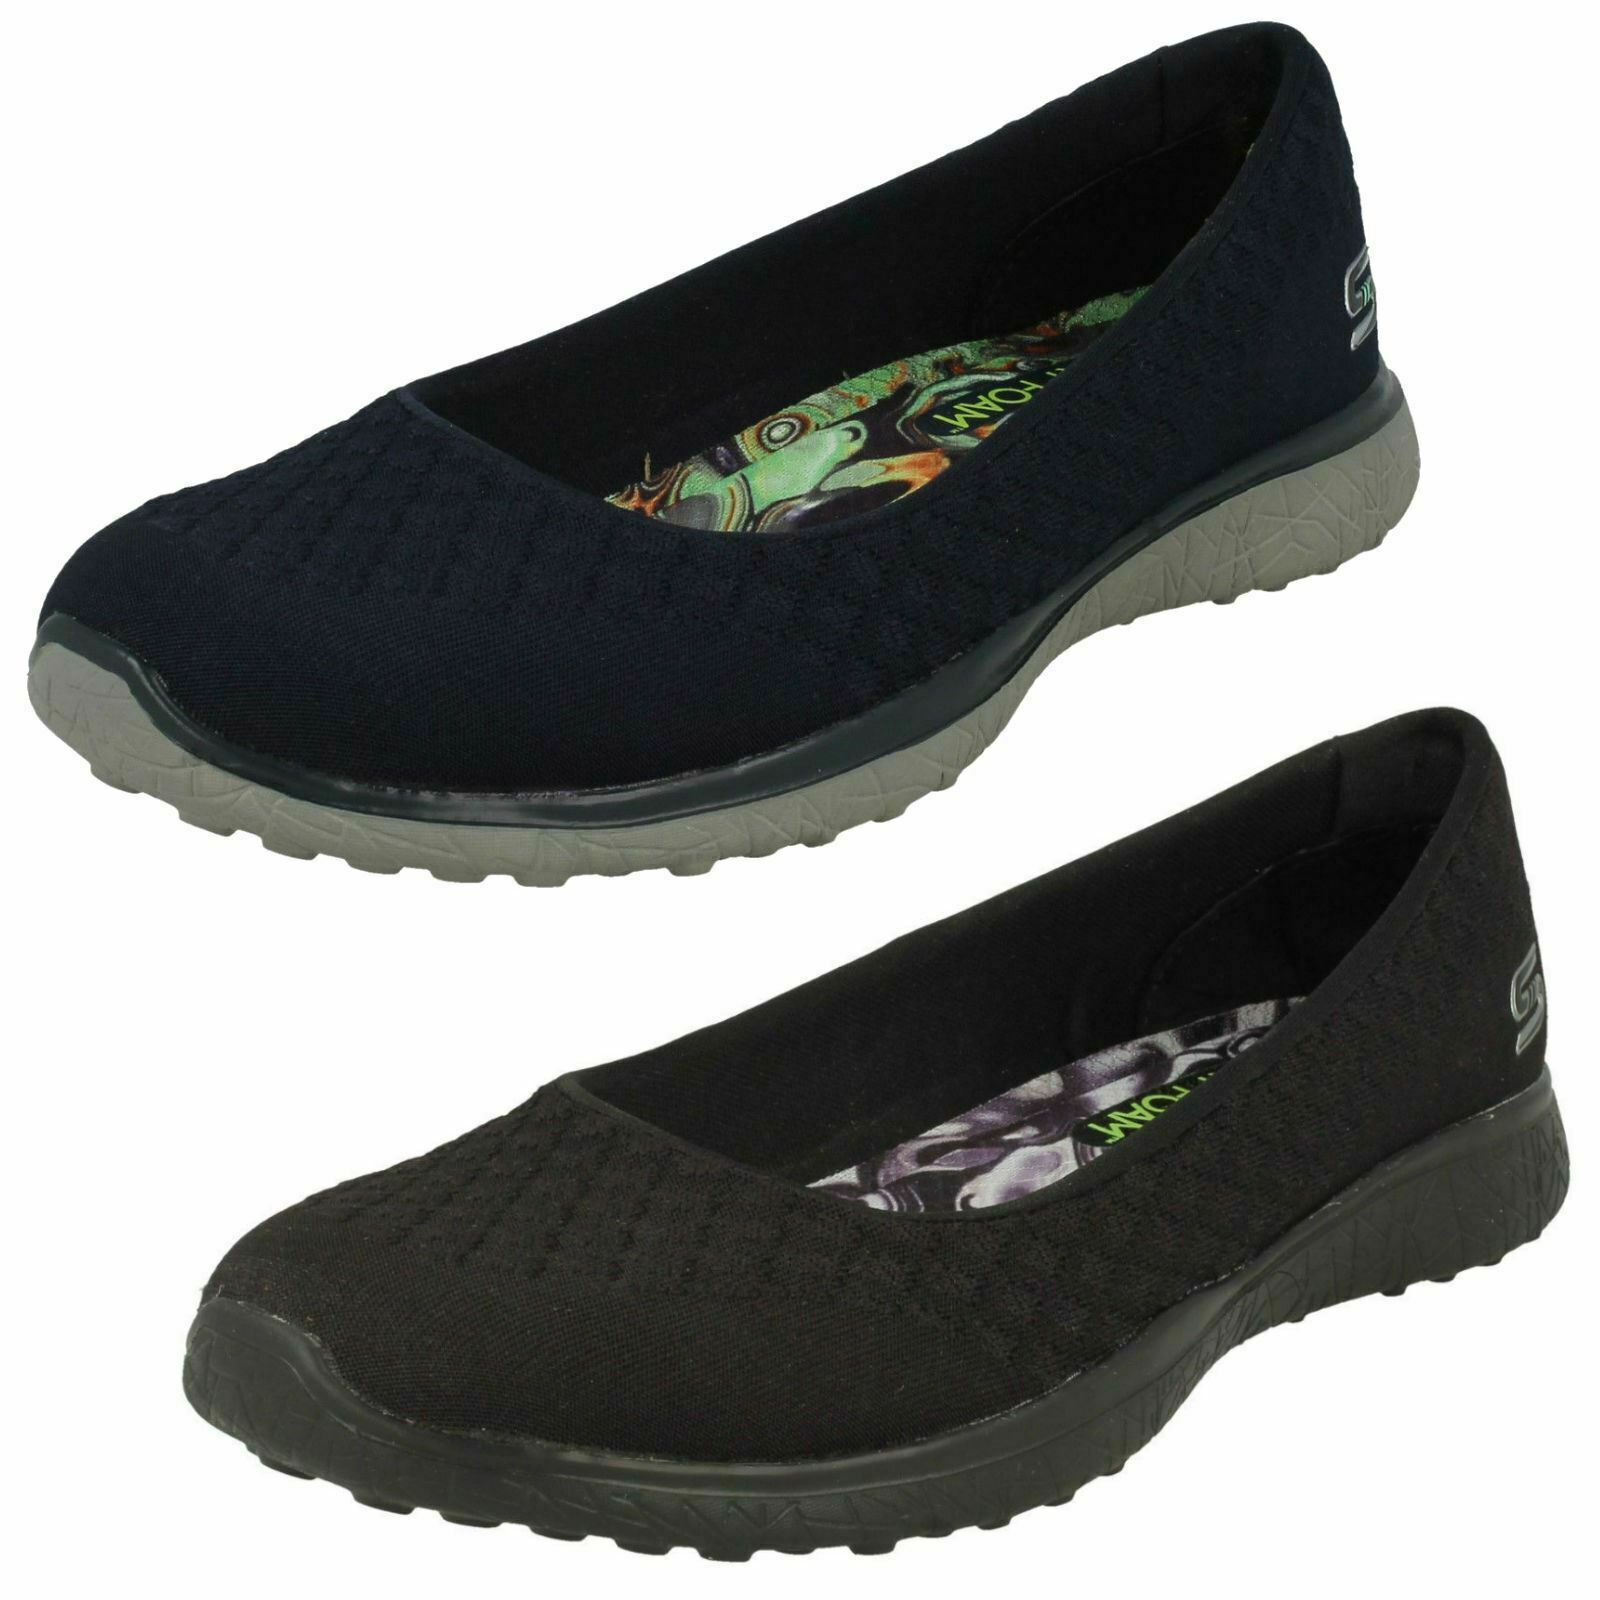 Femmes Skechers 23312 Microburst - One-Up Marine Chaussures Décontractées